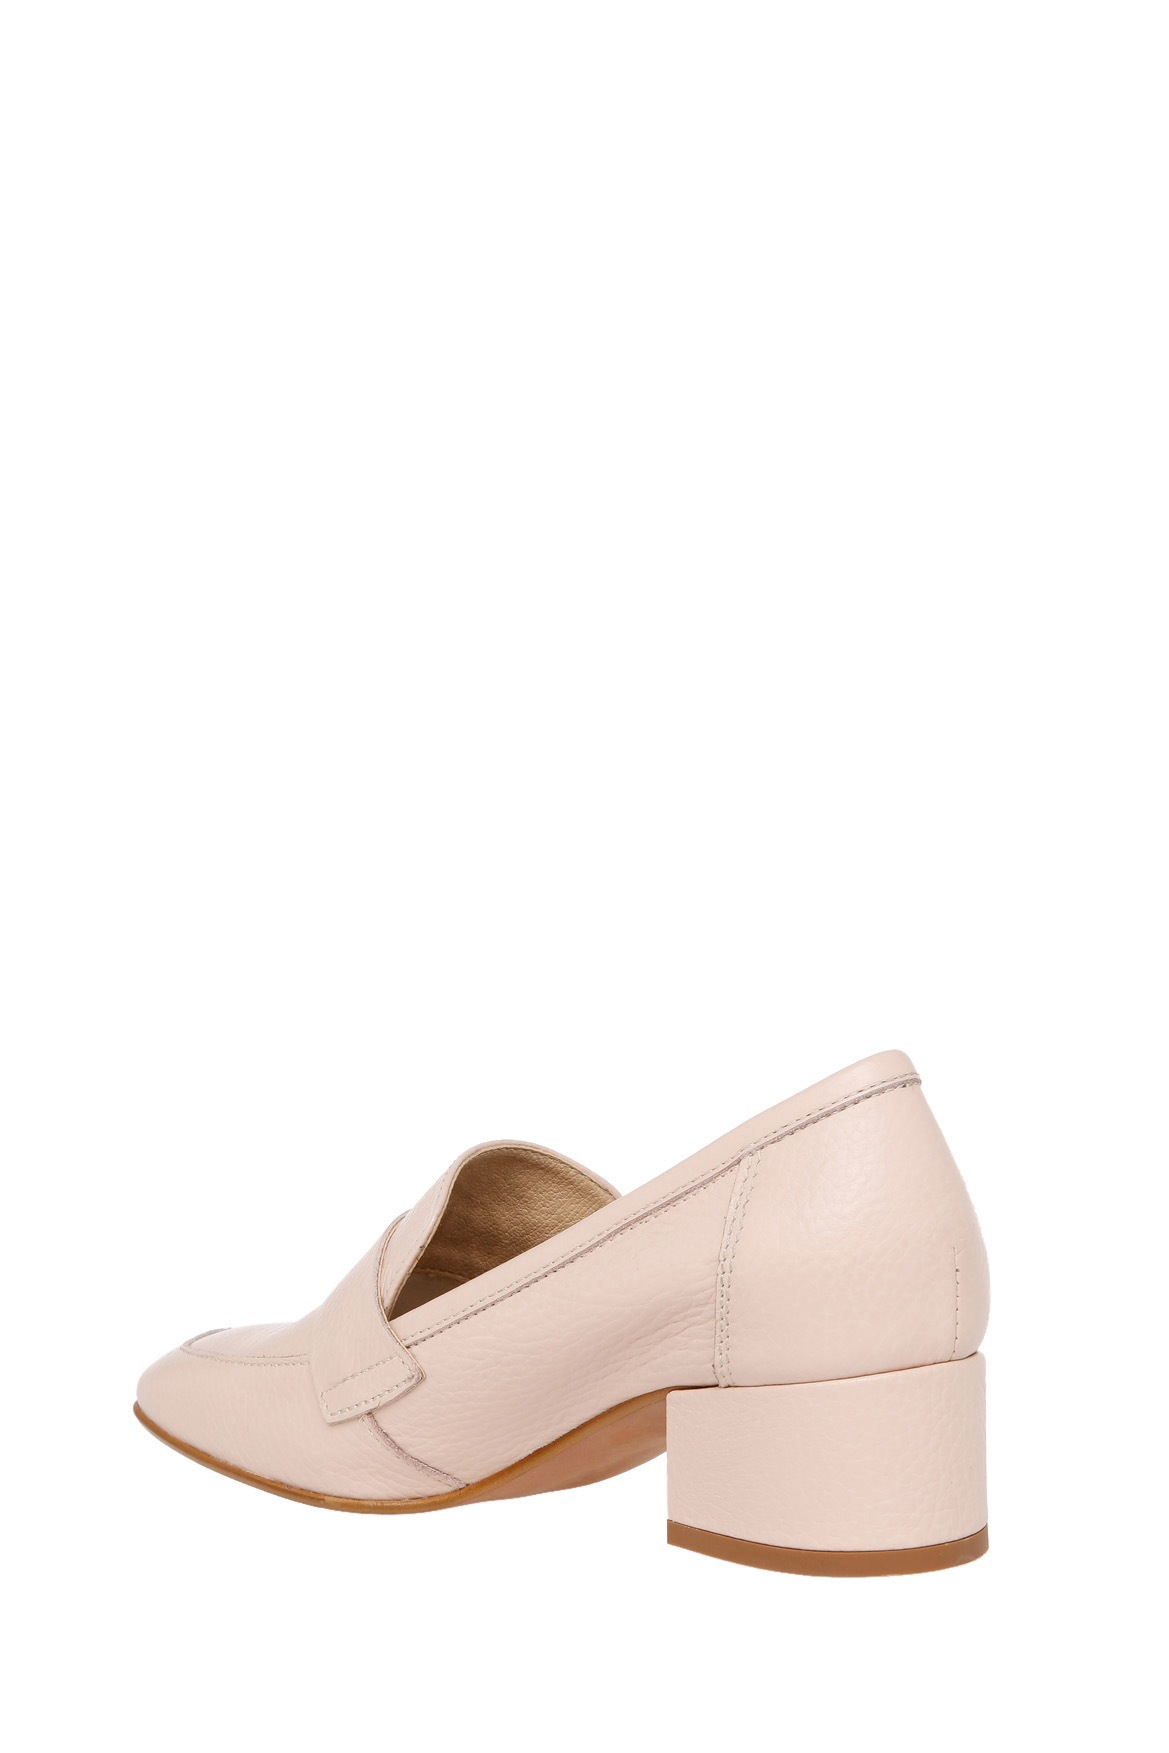 Myer Shoes Flats